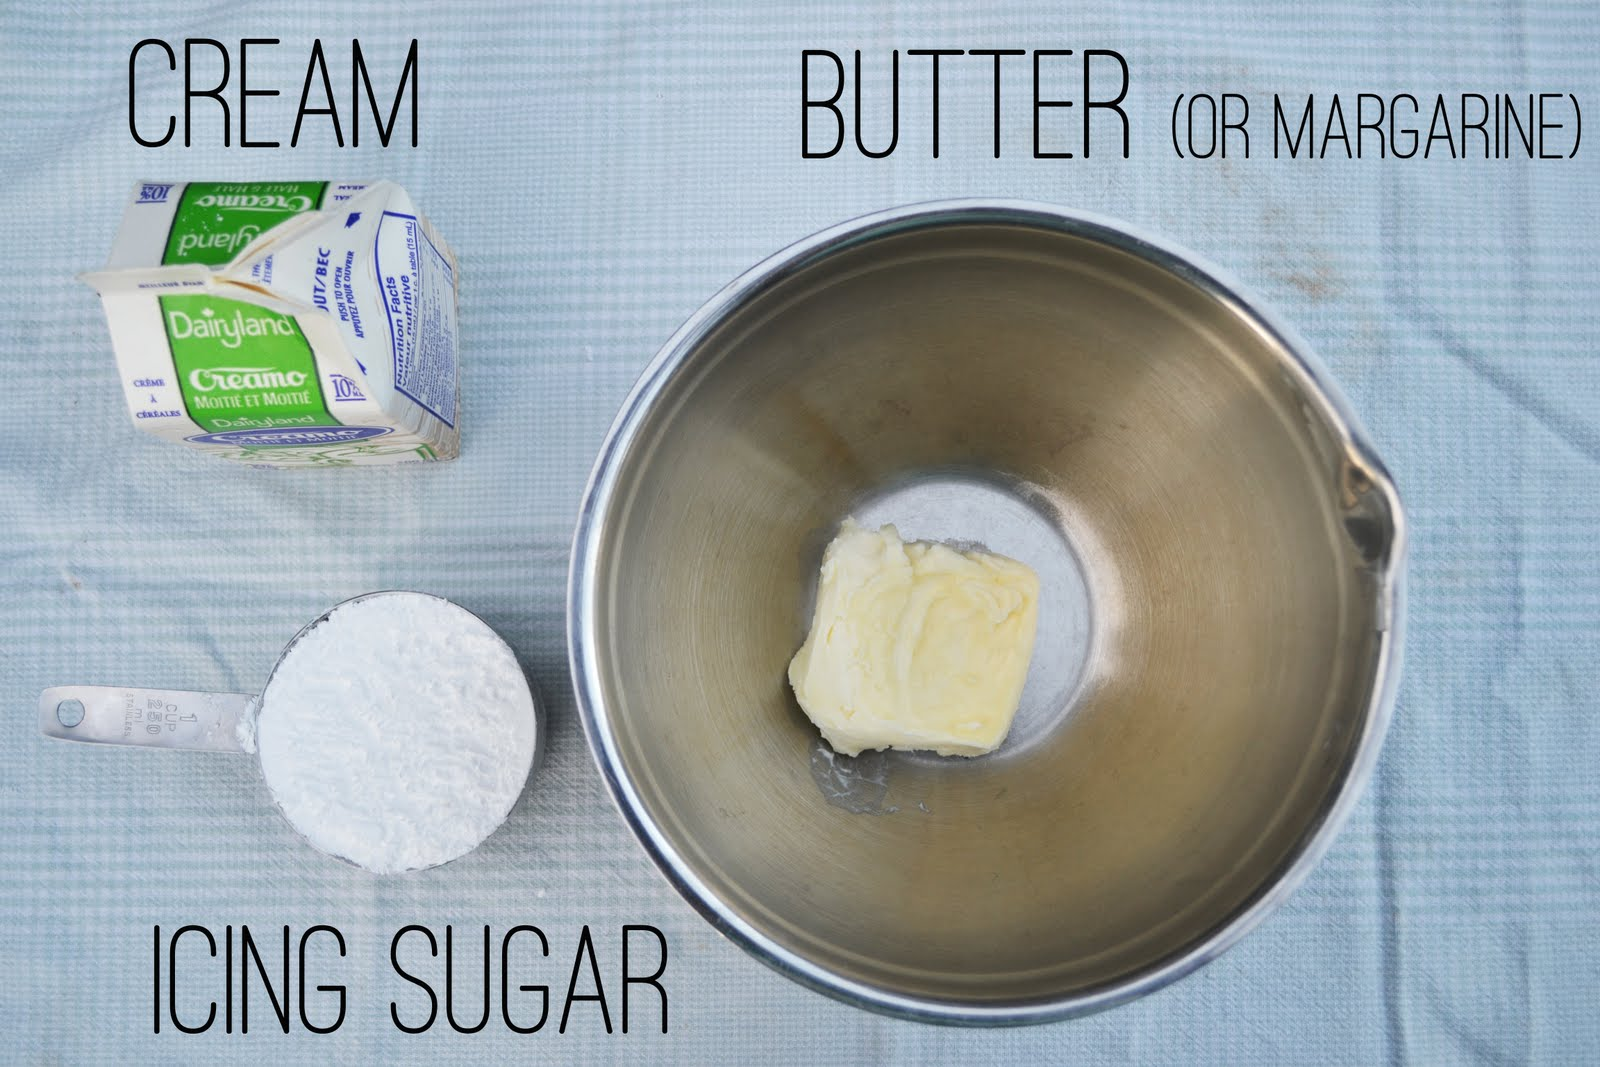 back to basics: buttercream icing